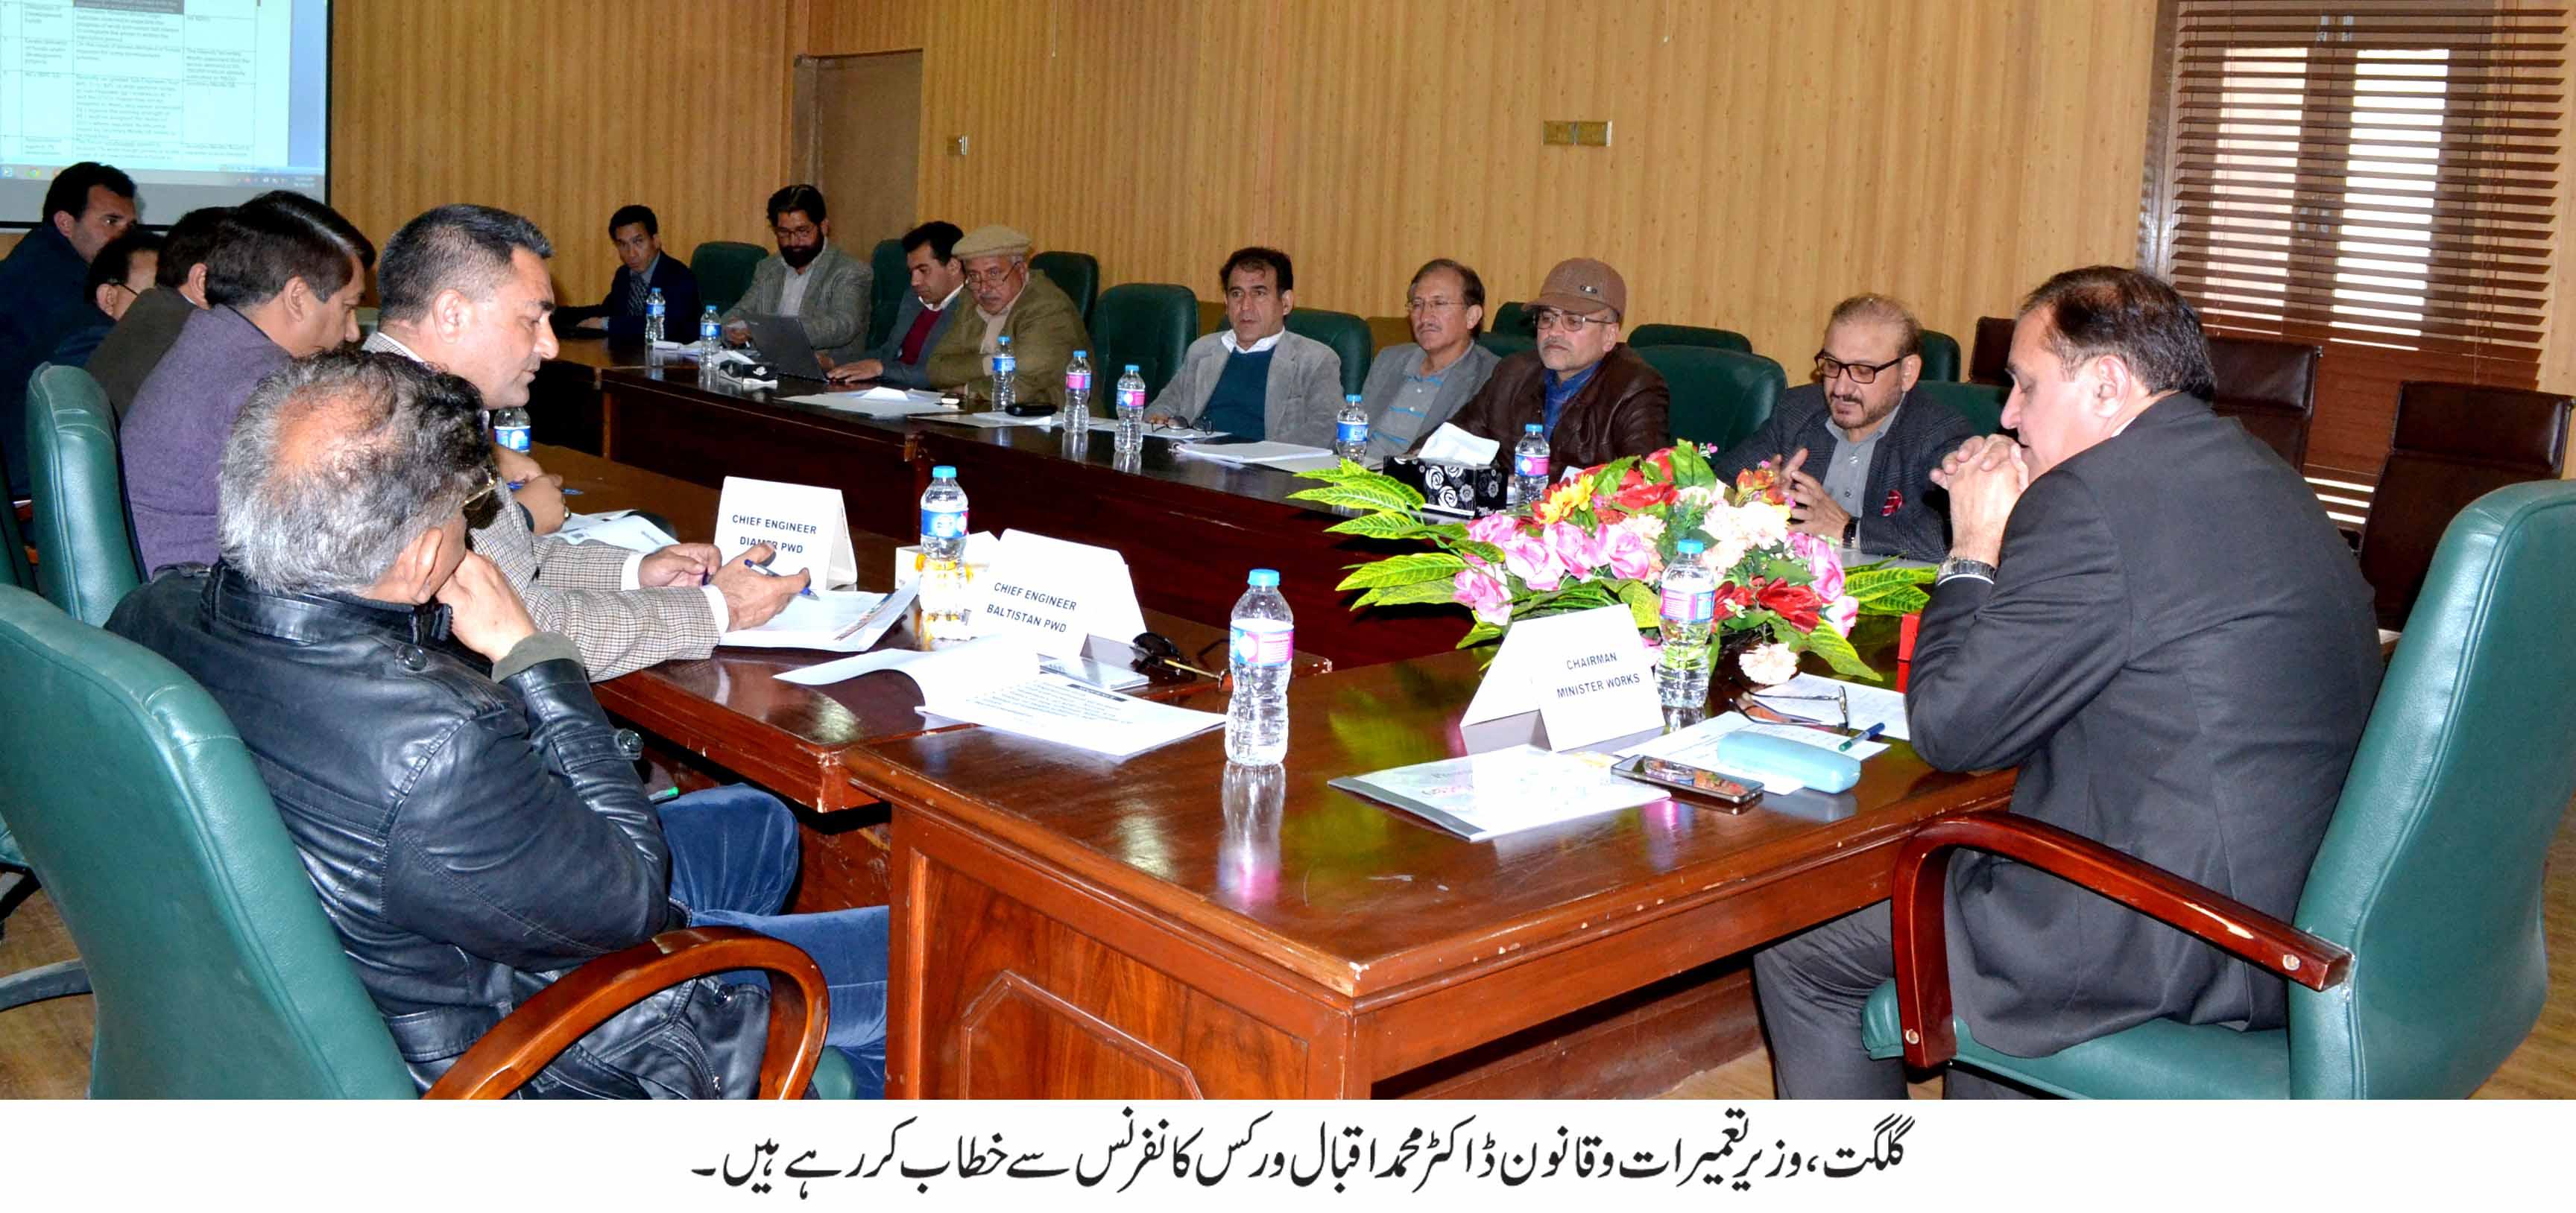 سرکاری افسیران عوامی خدمت کو اپنا شعار بنائے۔ صوبائی وزیر تعمیرات